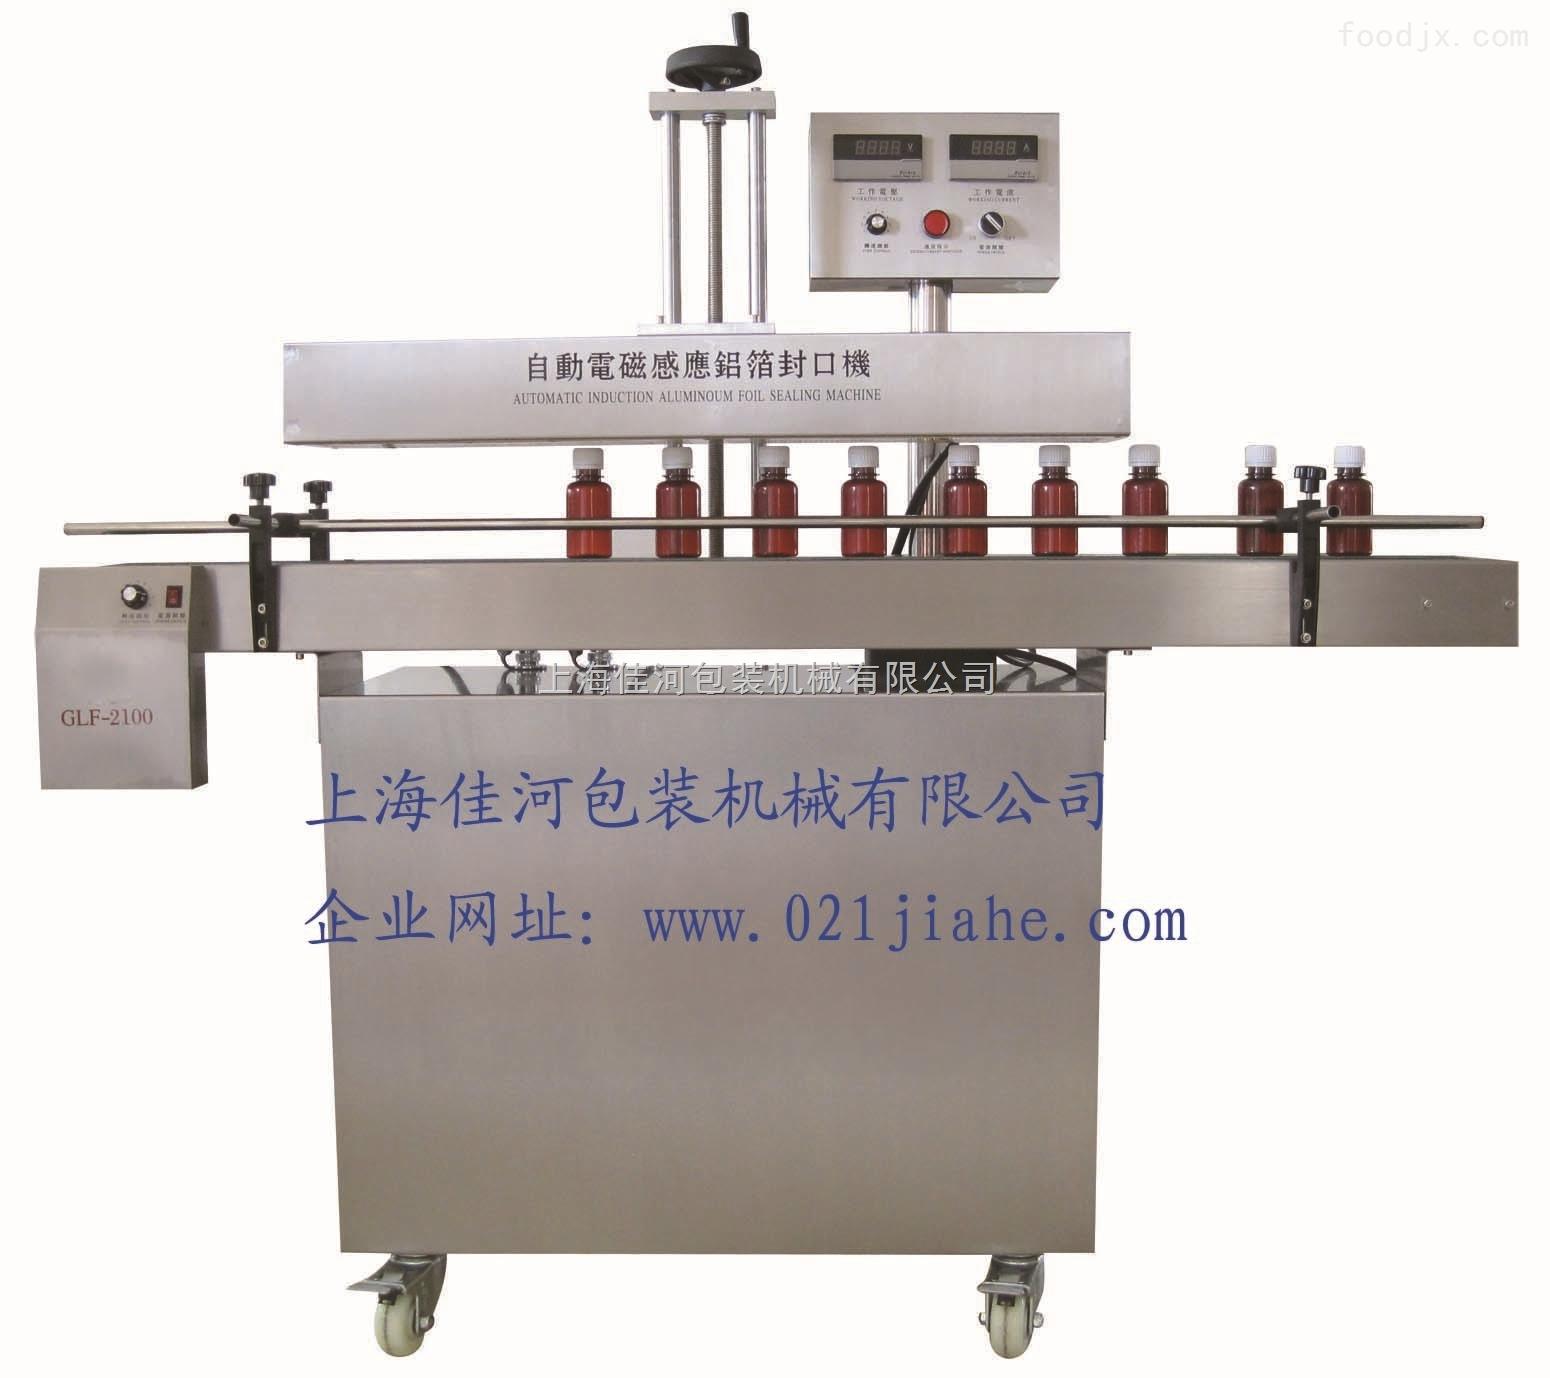 GLF-2100   自动超大口径  电磁感应铝箔封口机   药瓶封口机 塑料瓶